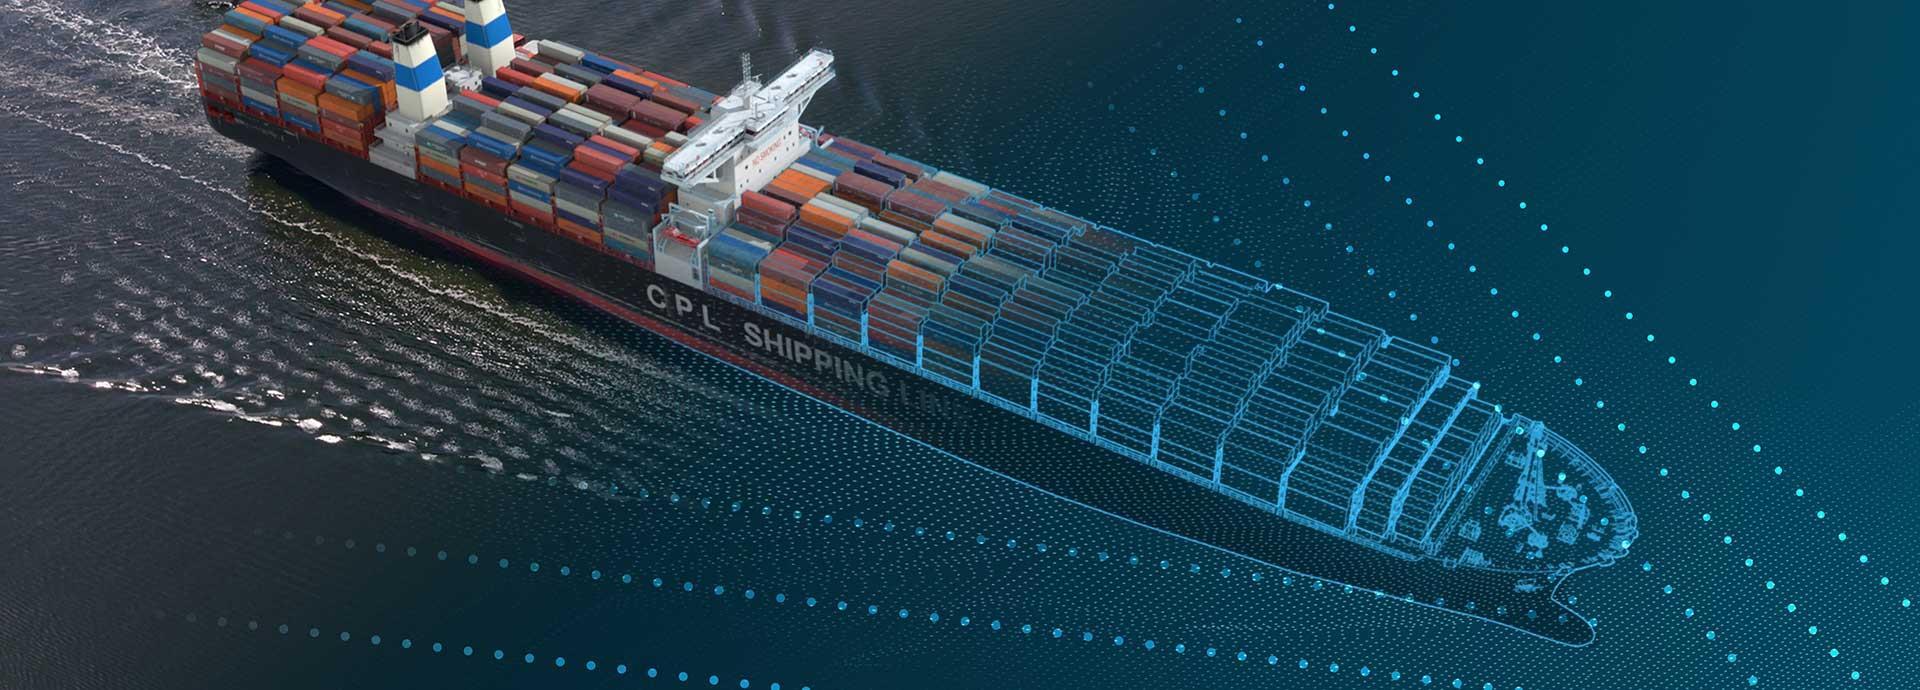 Maritime digitalisation: Where to start